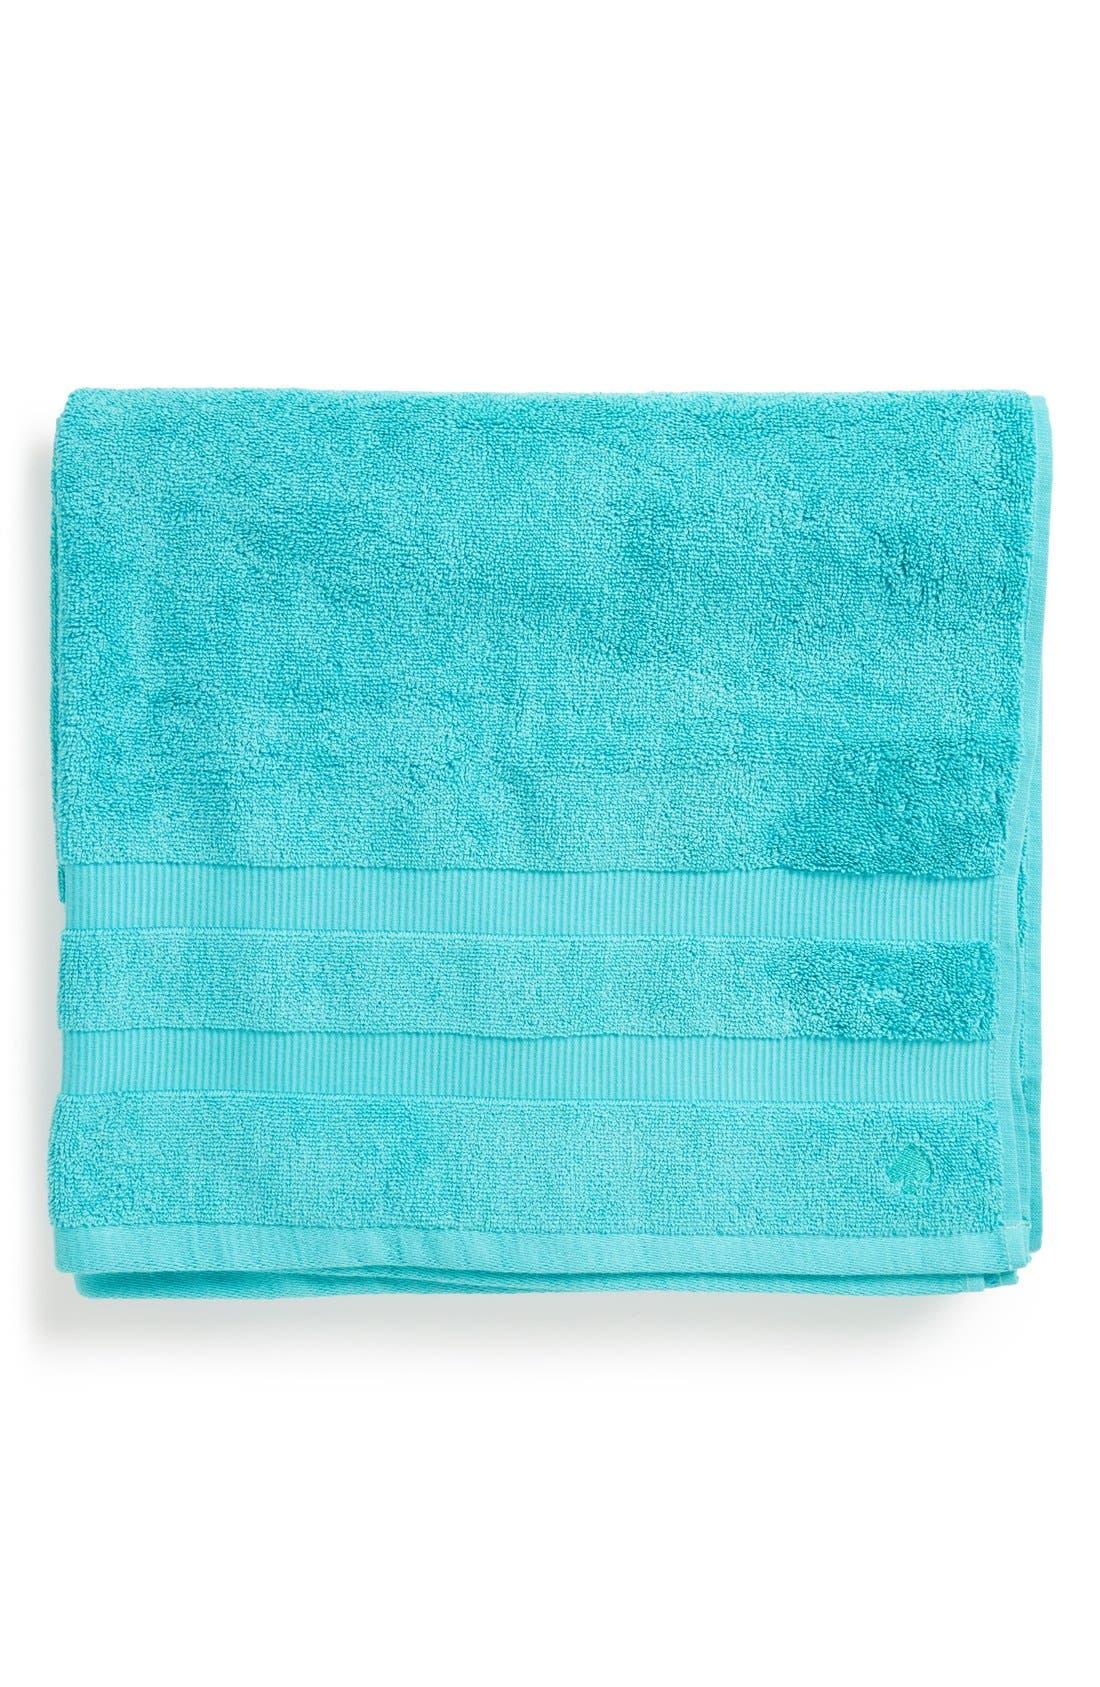 'chattam stripe' bath towel,                         Main,                         color, POOLSIDE